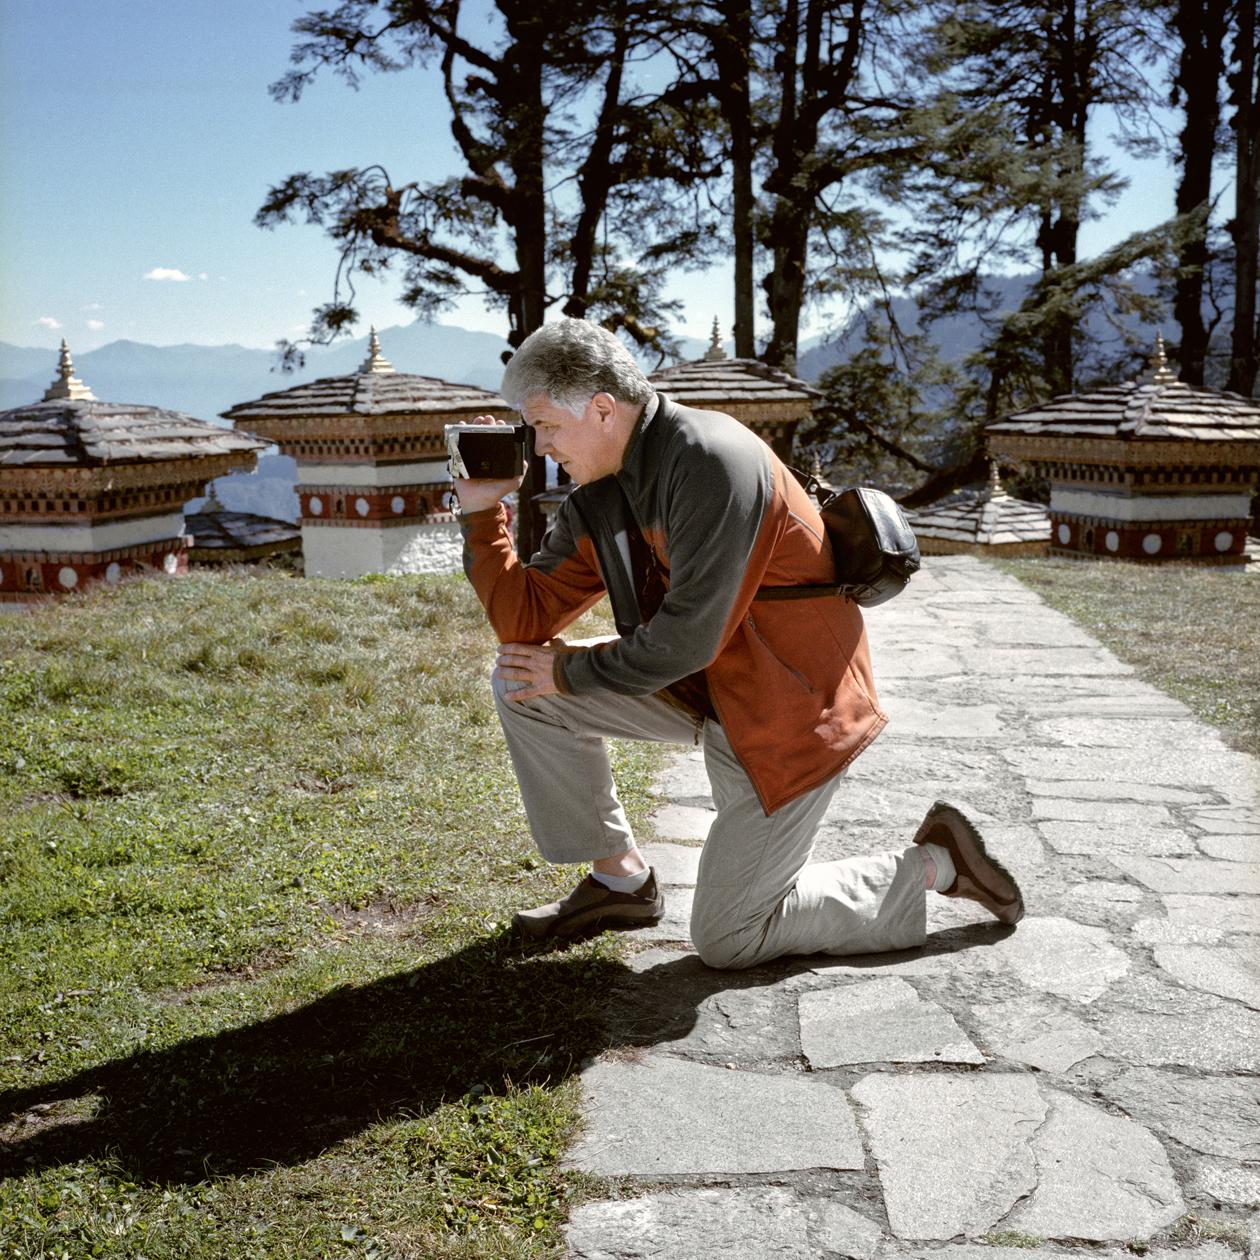 Adrien_Golinelli_Bhutan_03.jpg